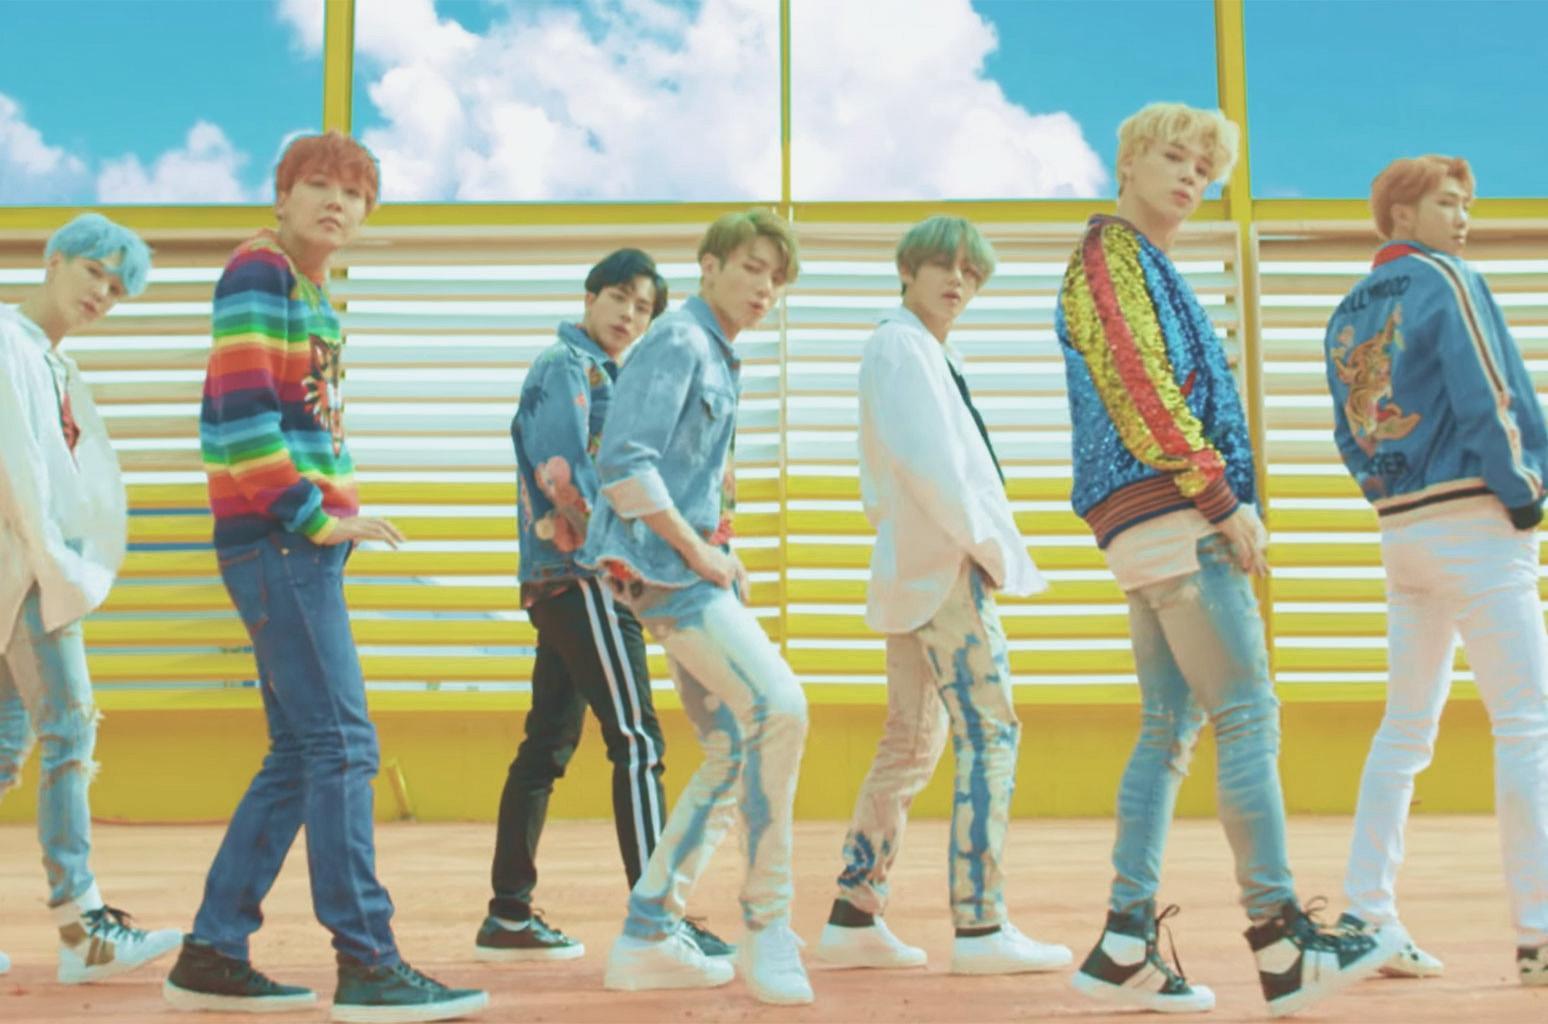 K-pop Article